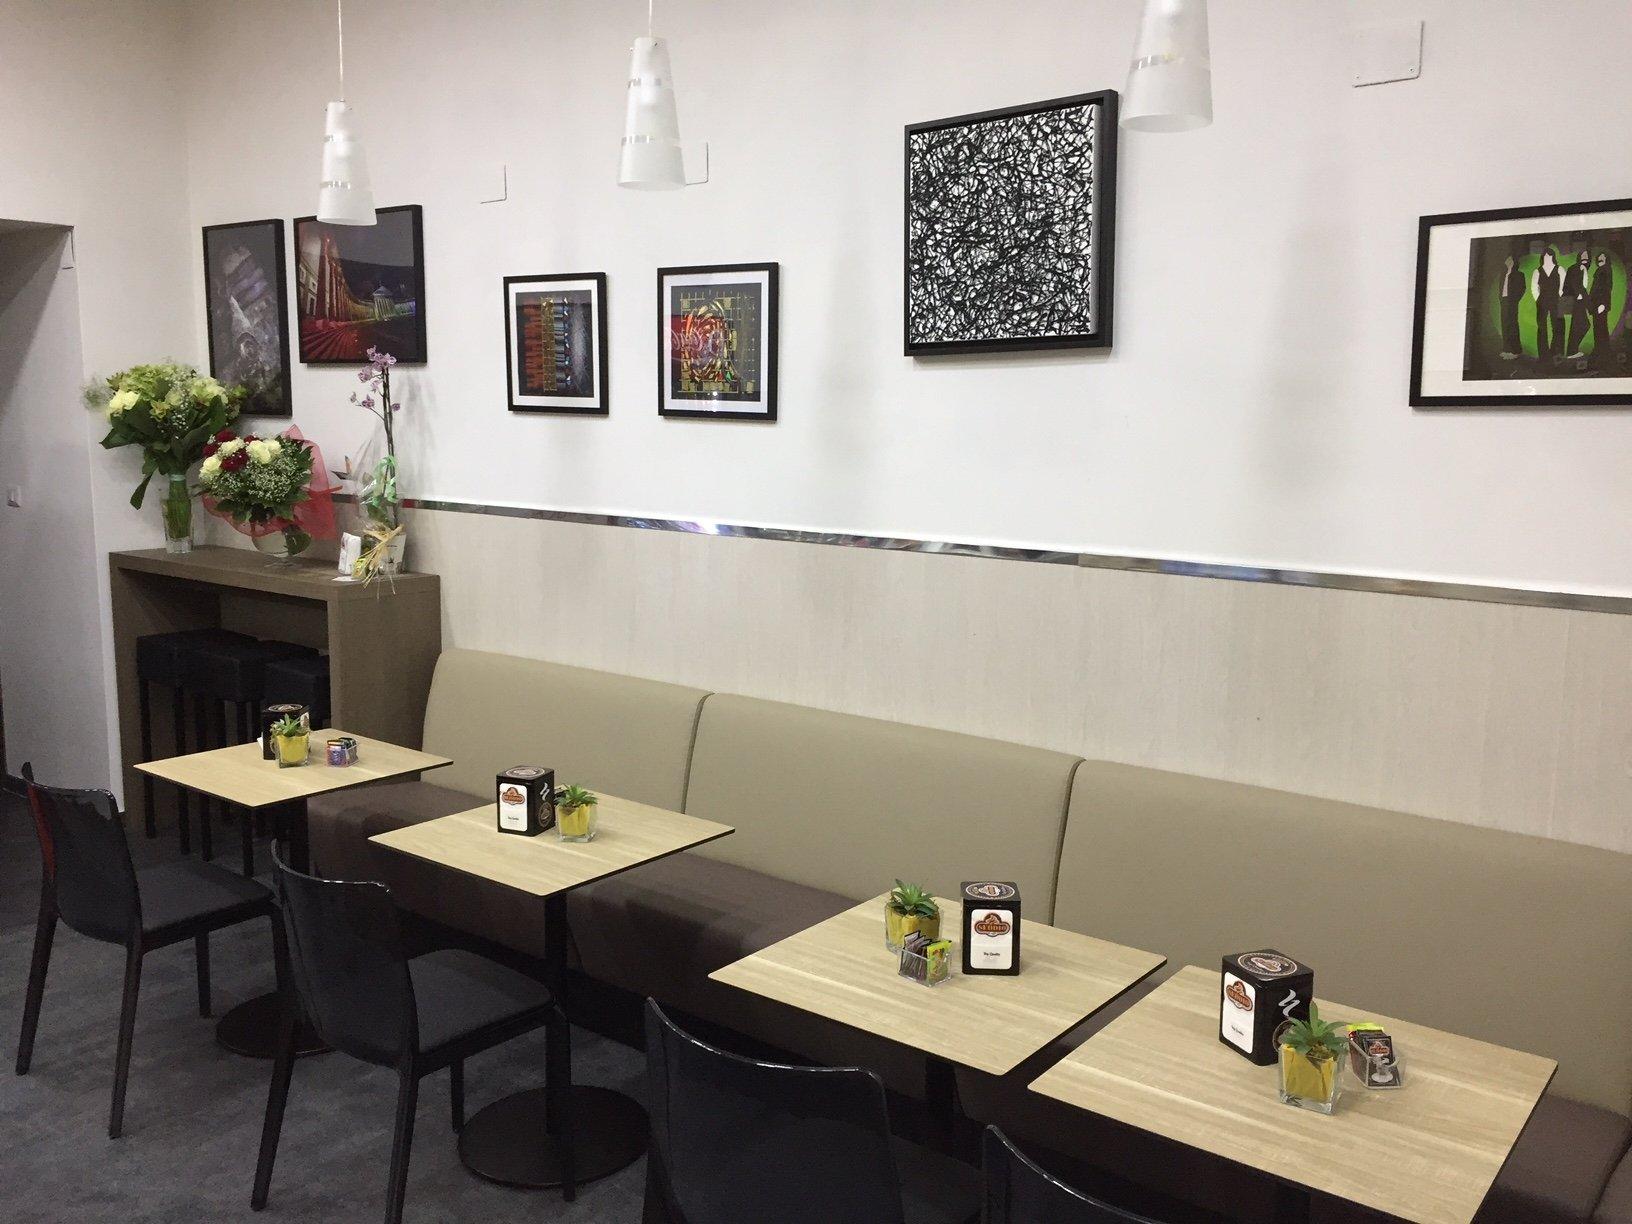 Domart Café, Napoli